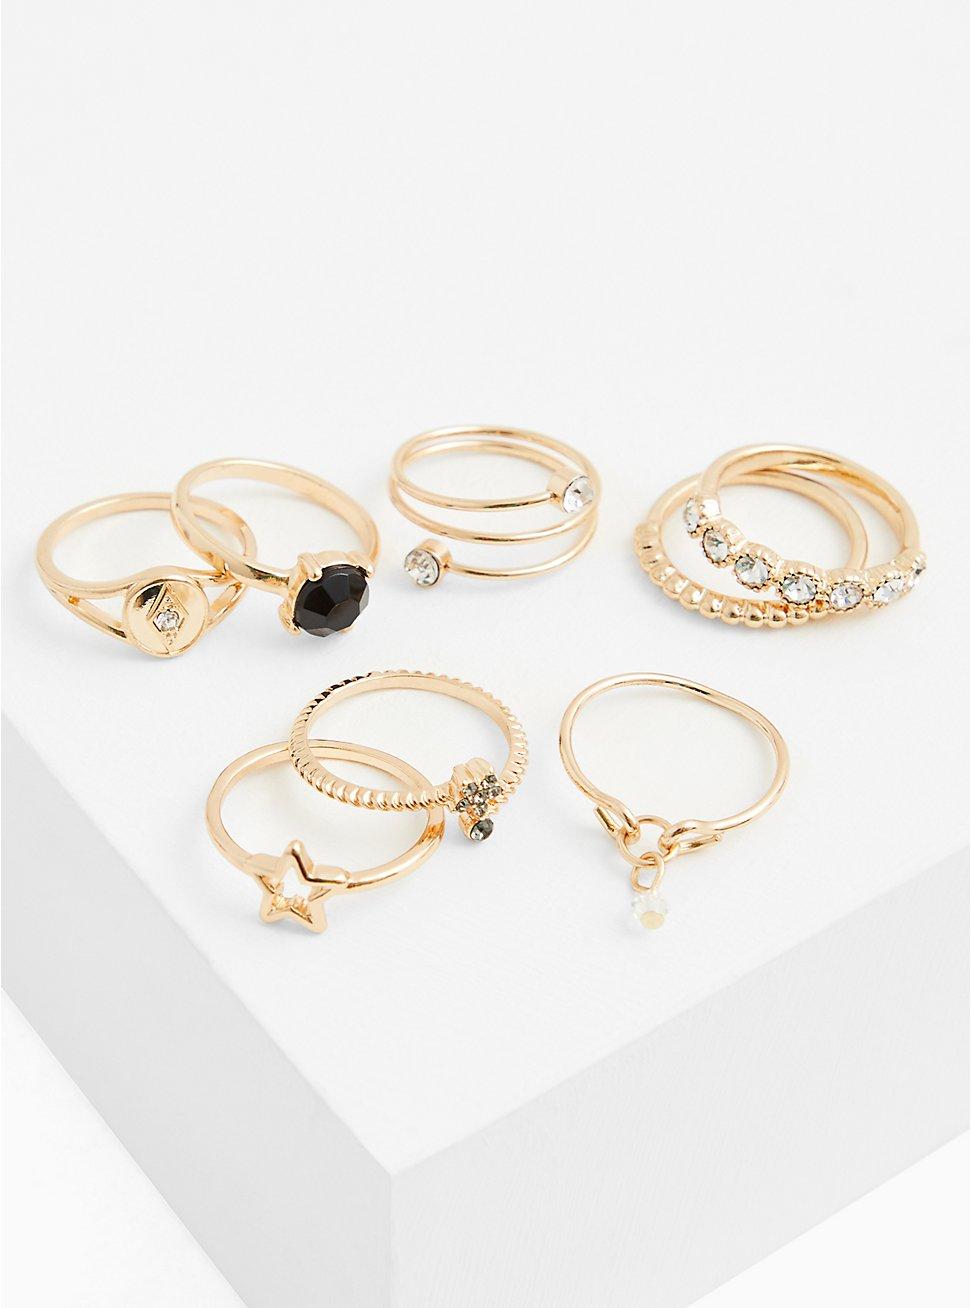 Gold-Tone Black Faux Stone Ring Set - Set of 8, SILVER, hi-res